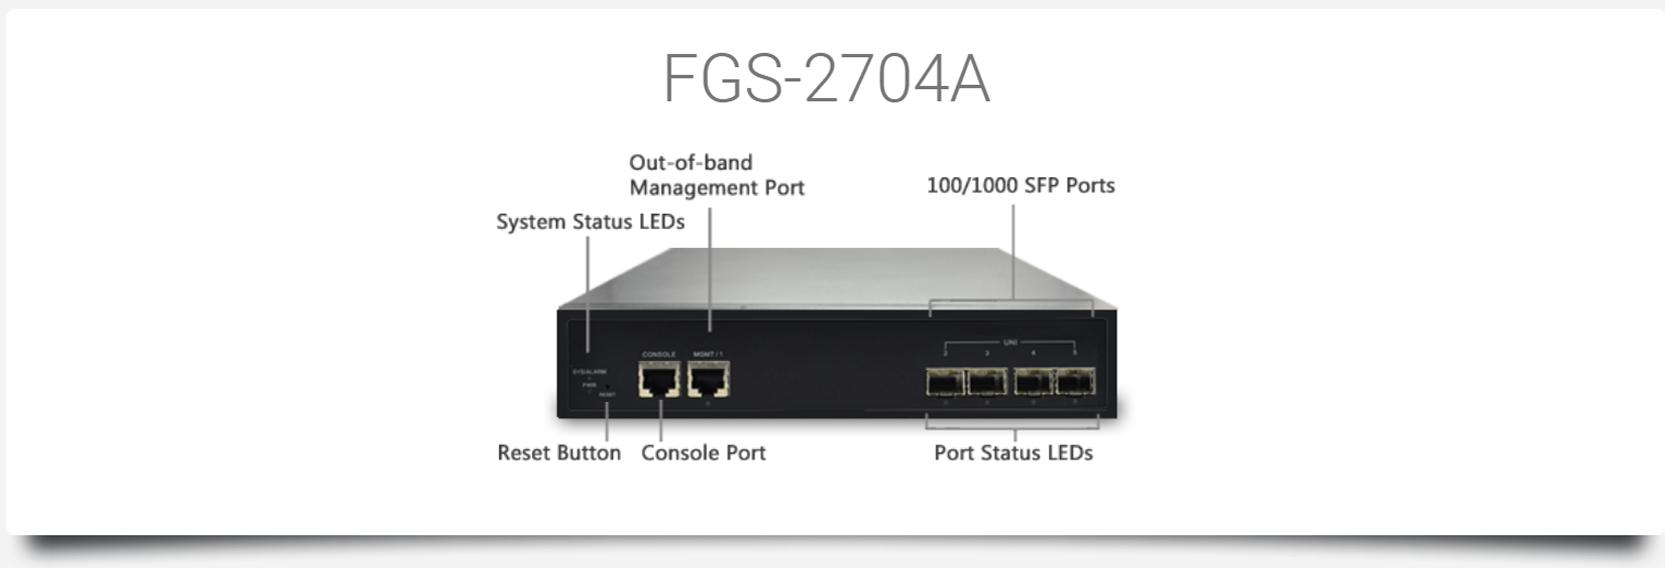 FGS-2704A